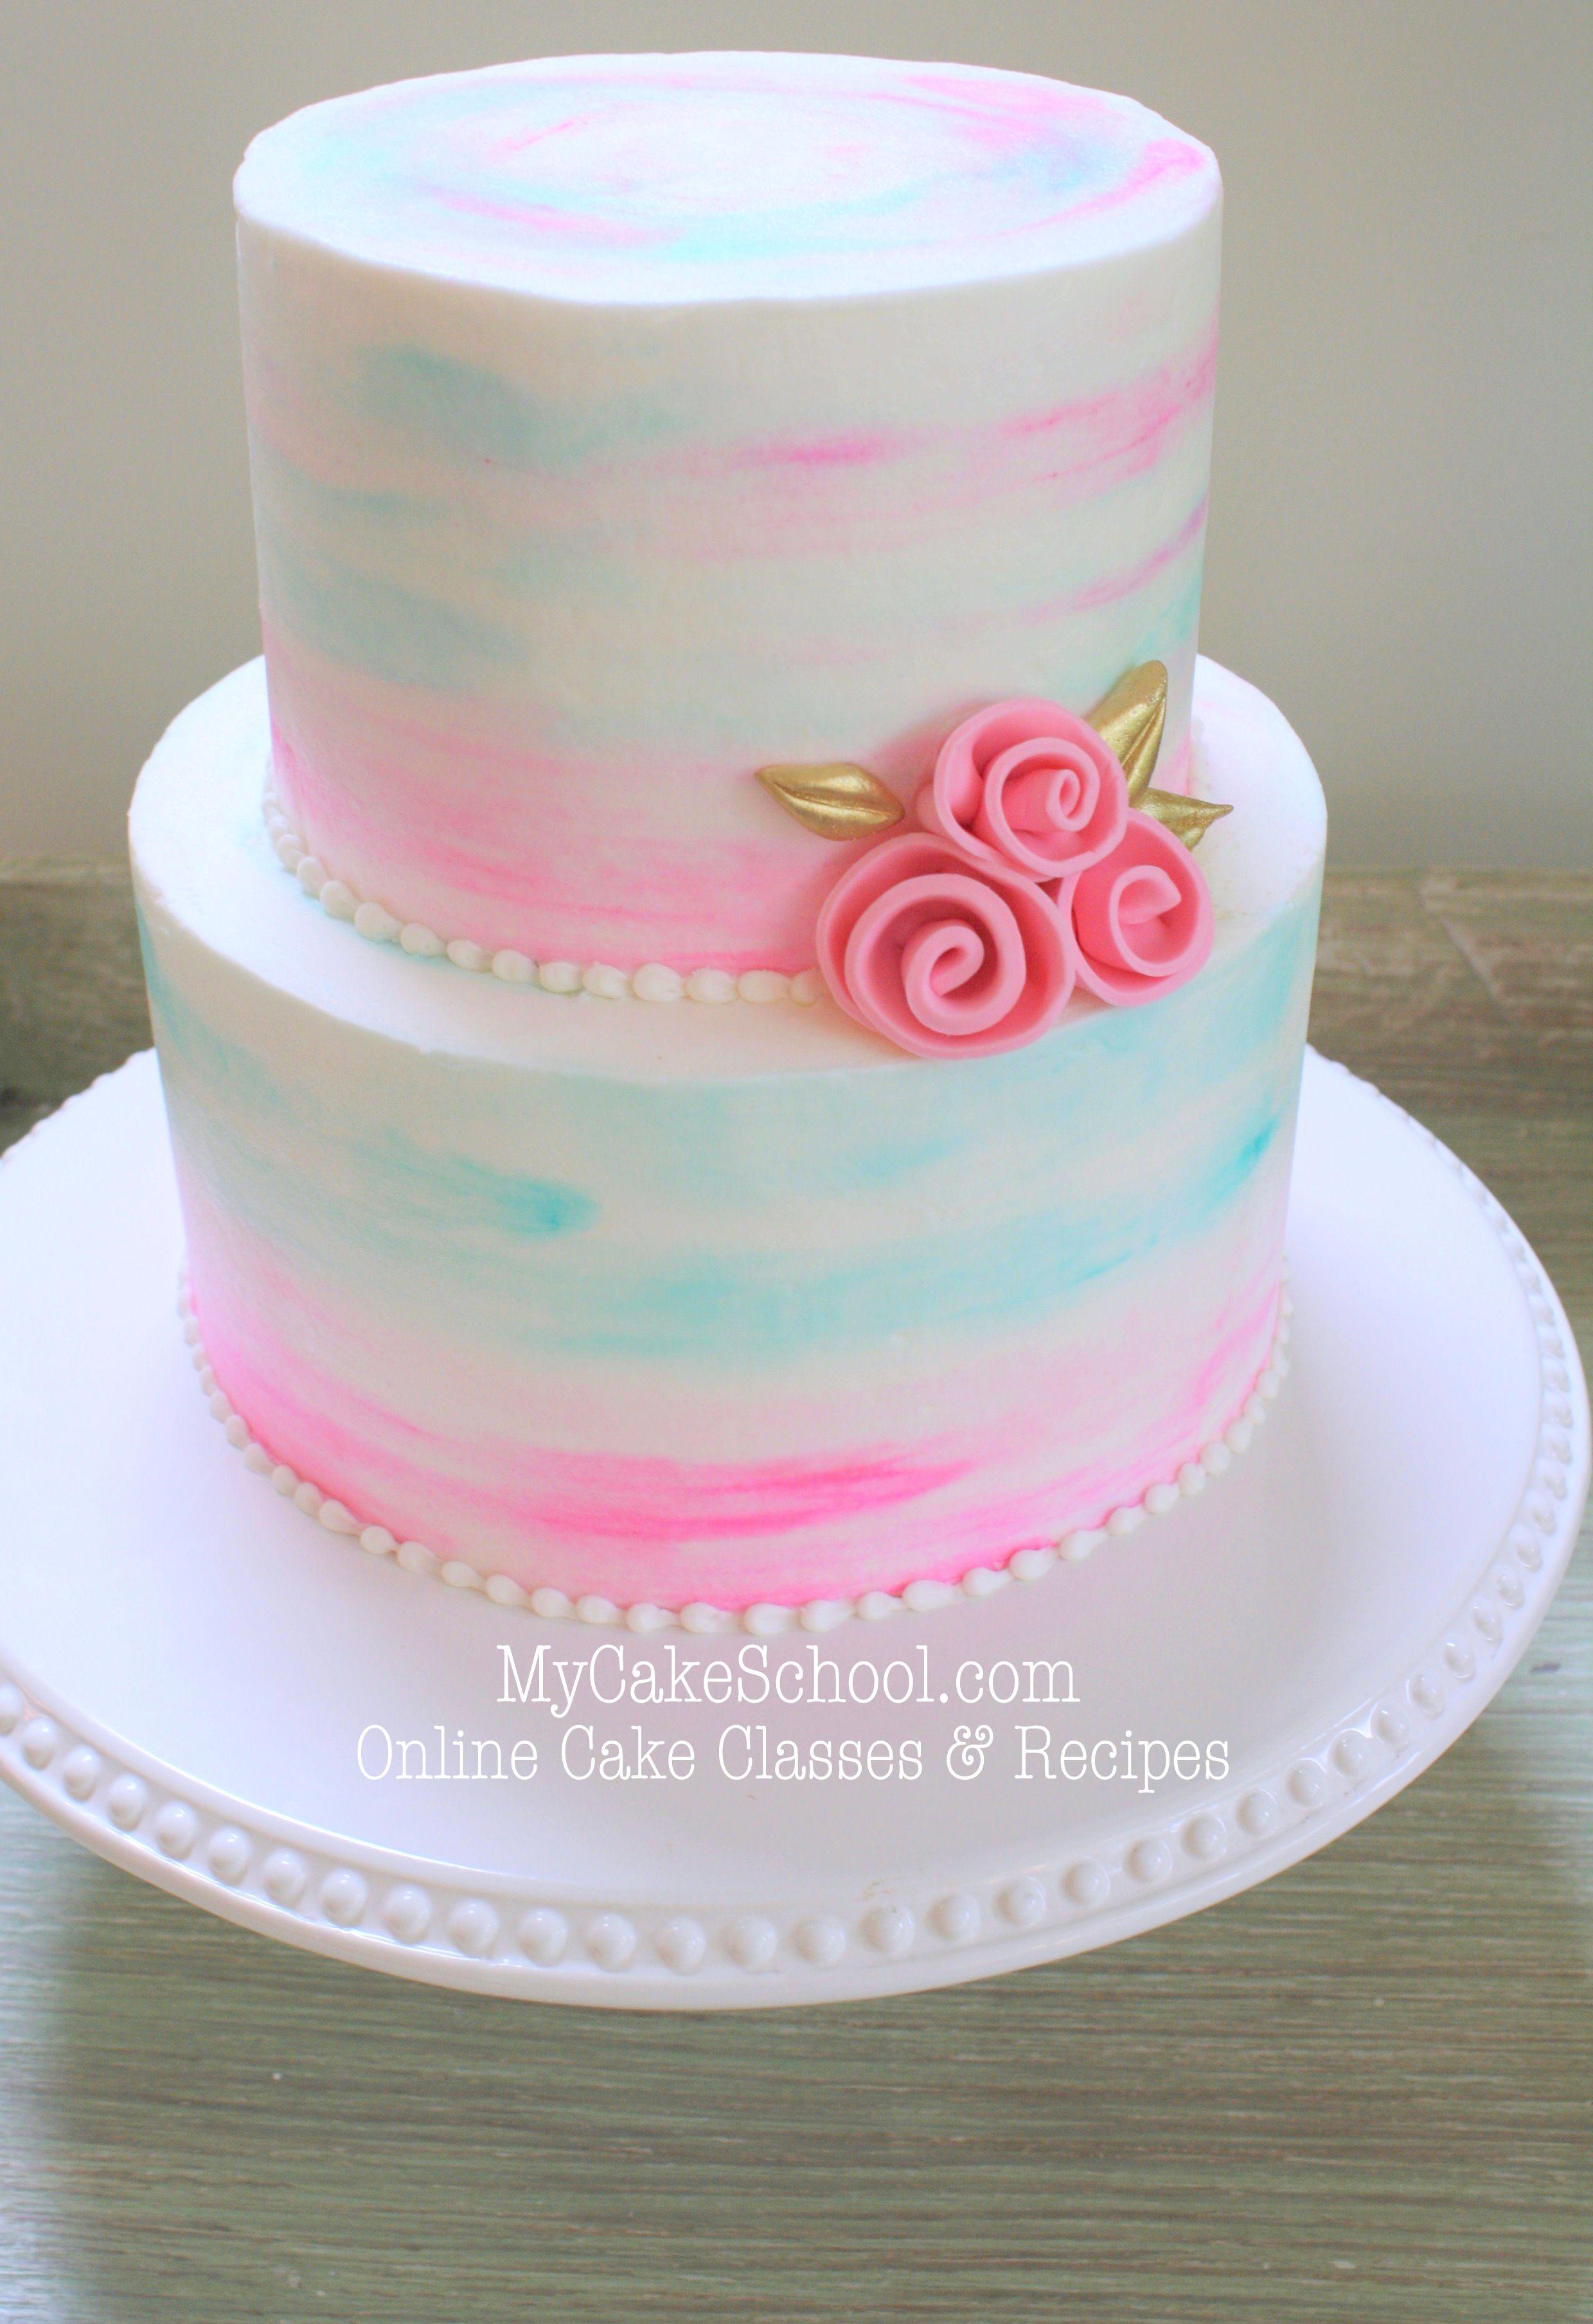 Watercolor Buttercream Cake Decorating Video Dessert